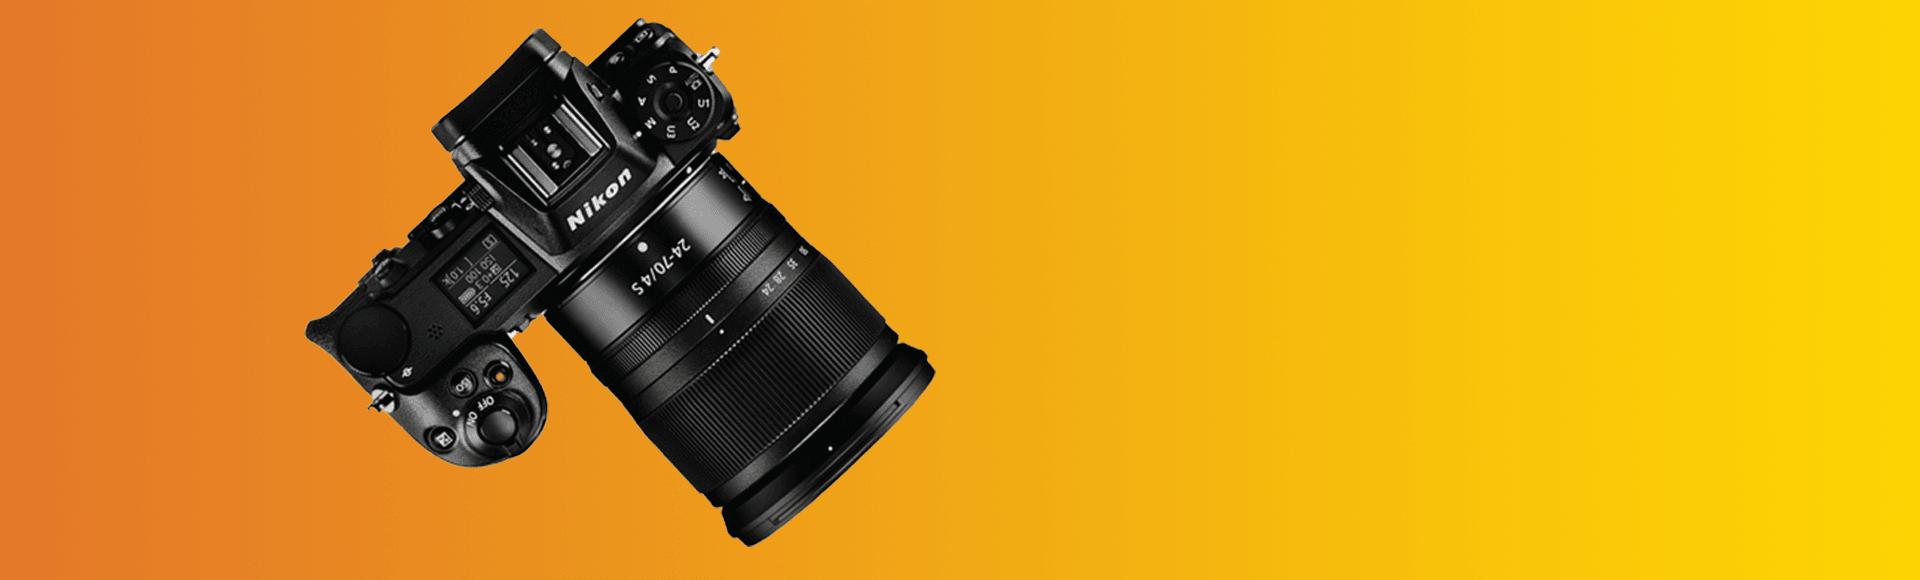 Trade Up To Nikon's Z